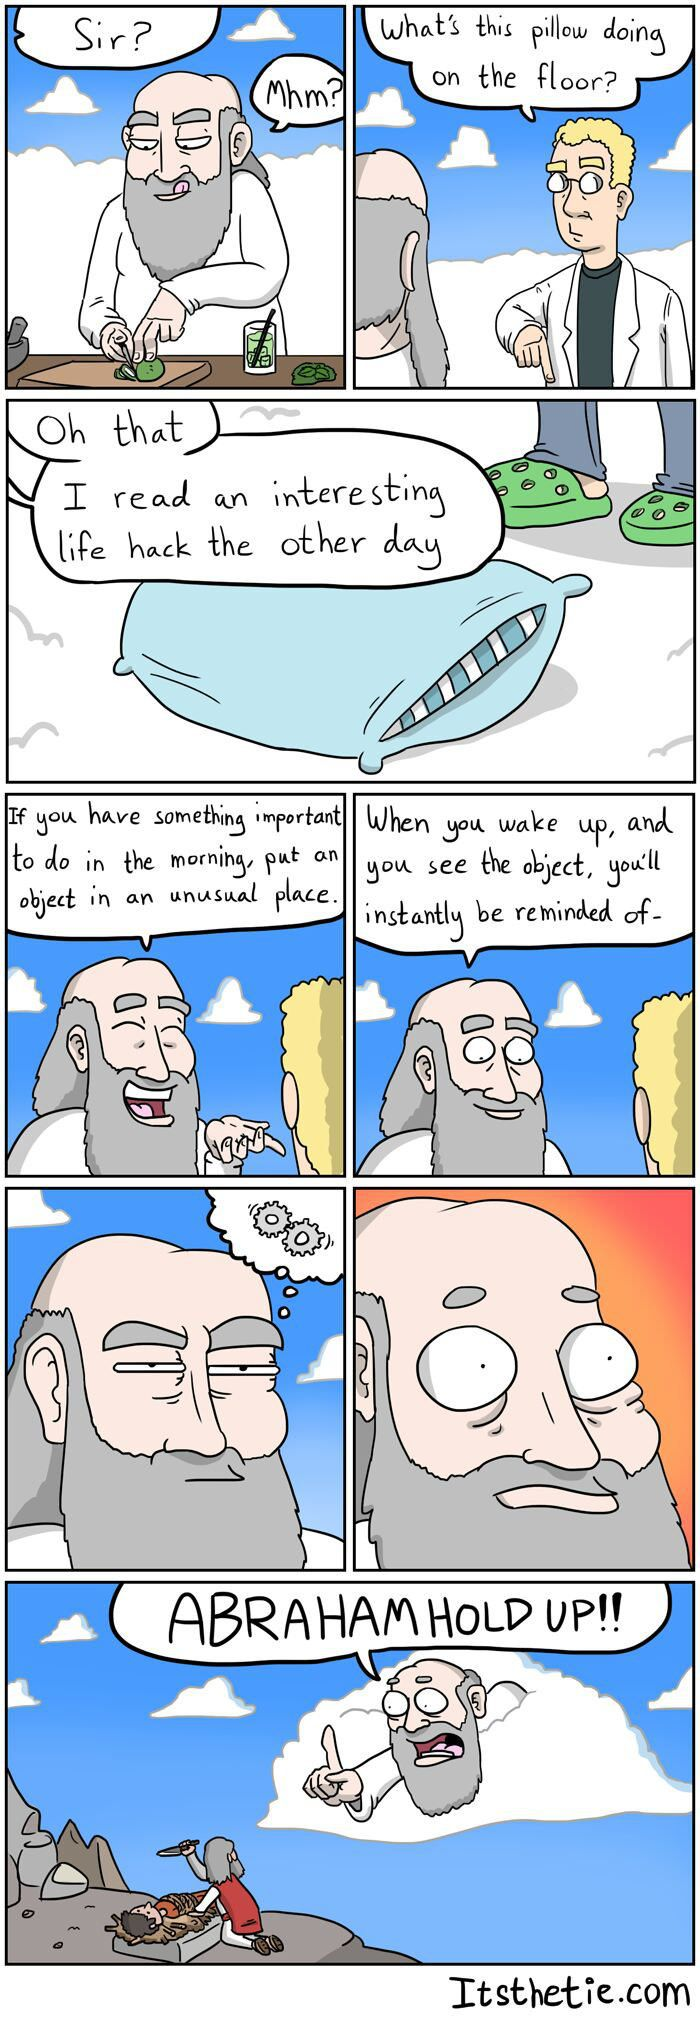 Adventures of God: Life Hack - 9GAG